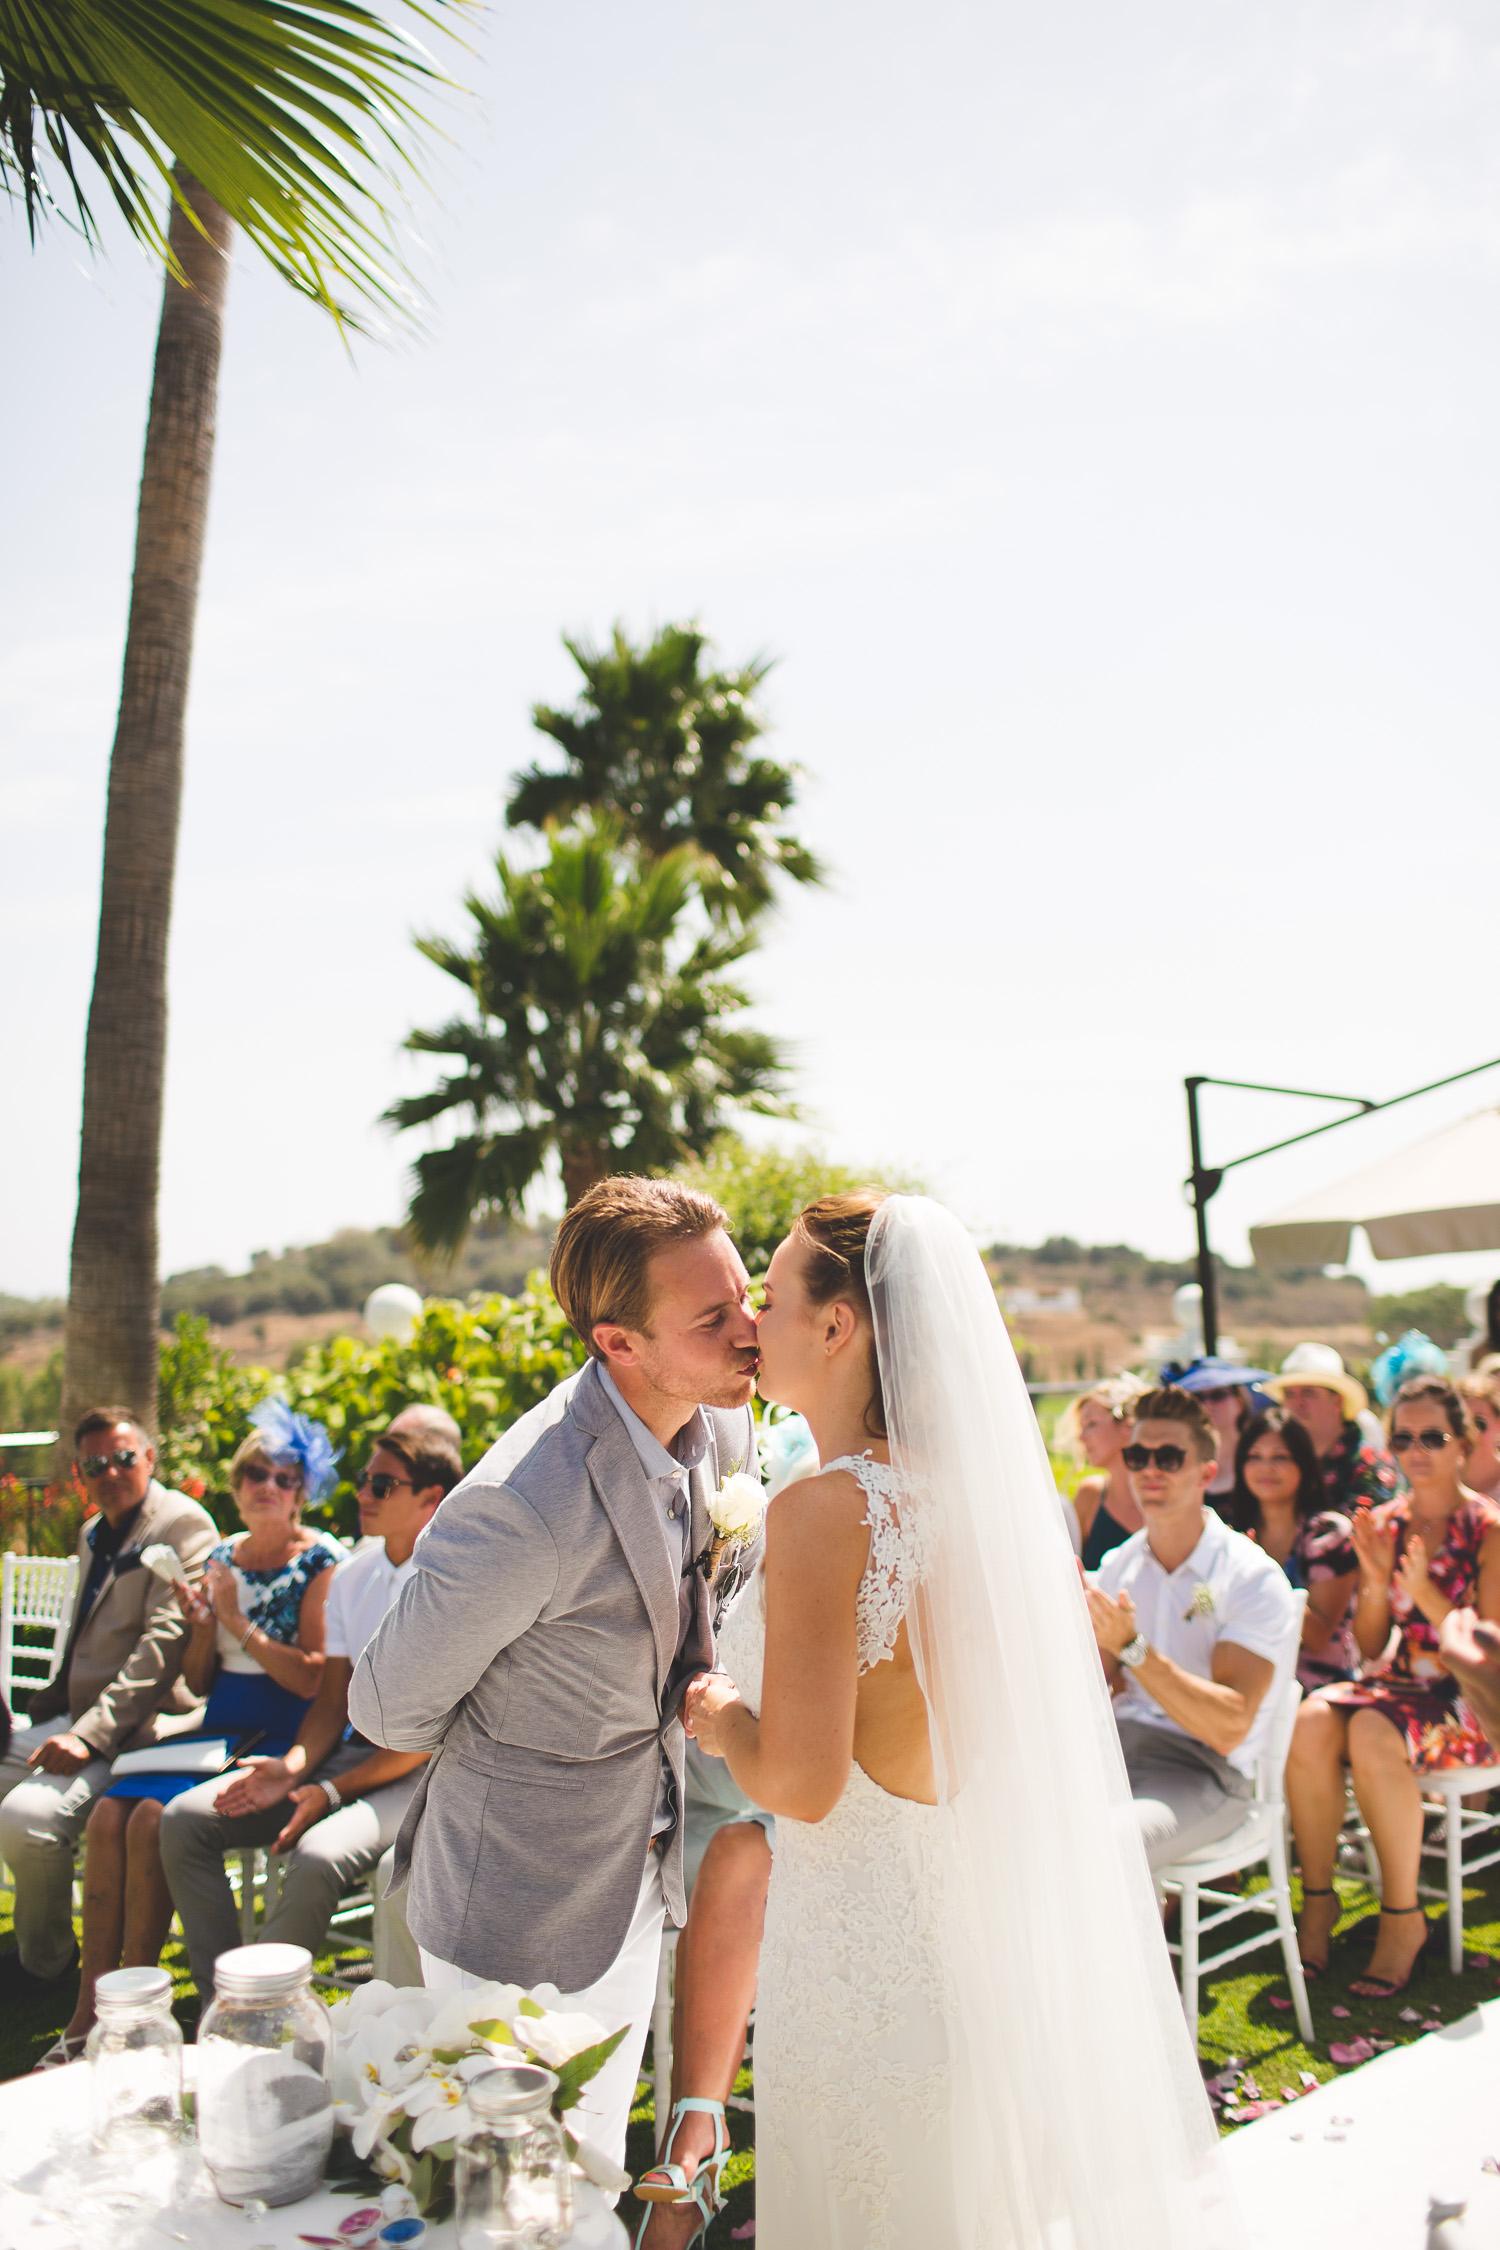 Surrey Wedding Photographer Kit Myers Paige Craig Spain064.jpg